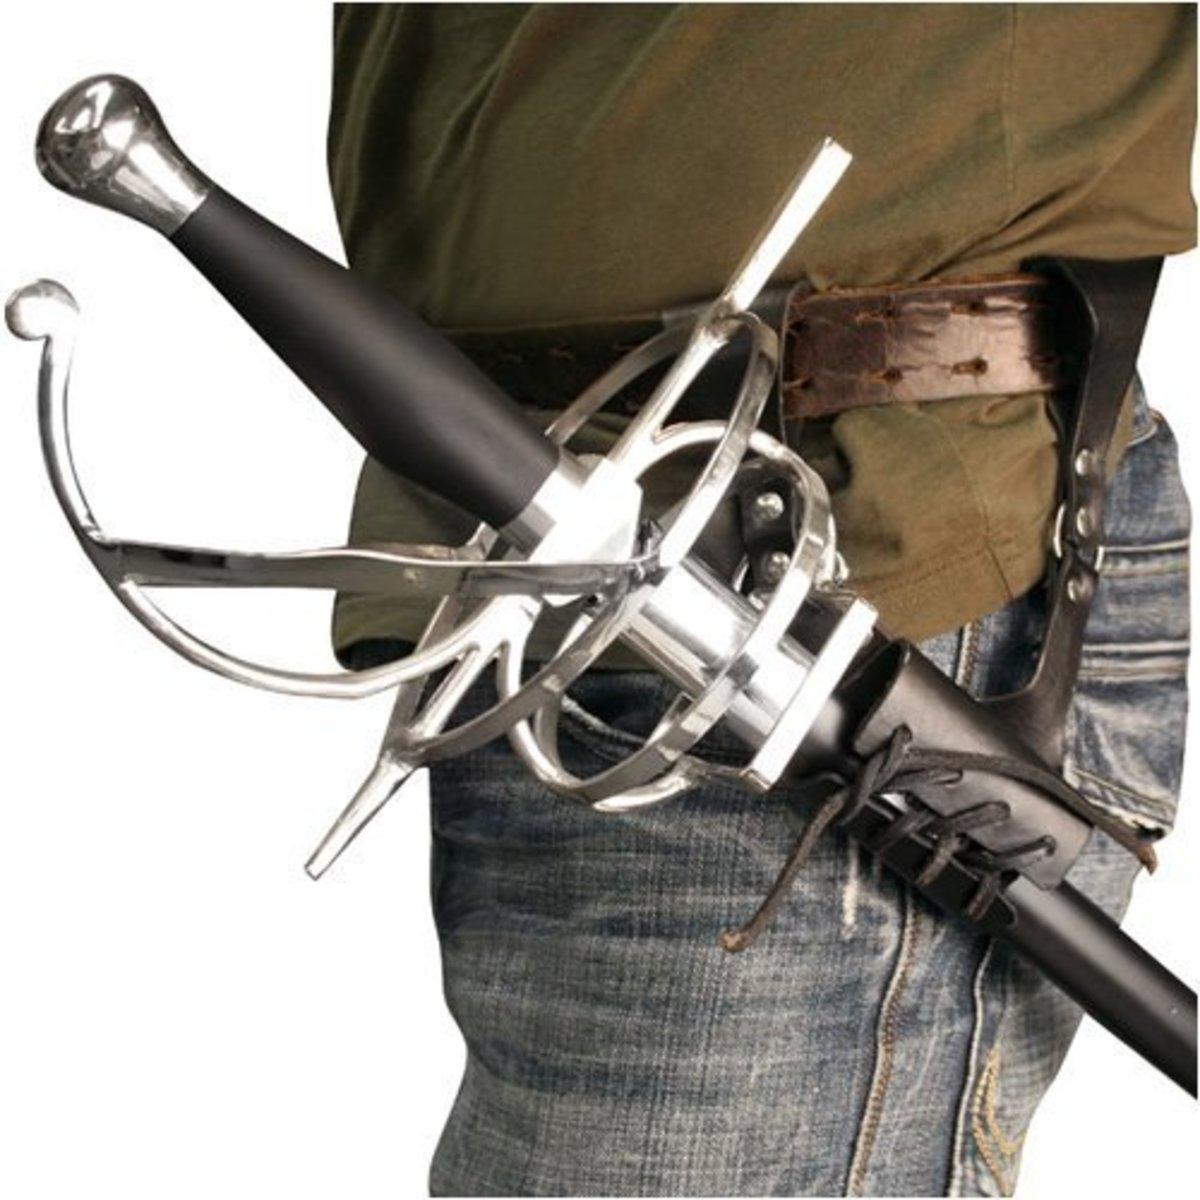 A frog hanger is a belt for your sword